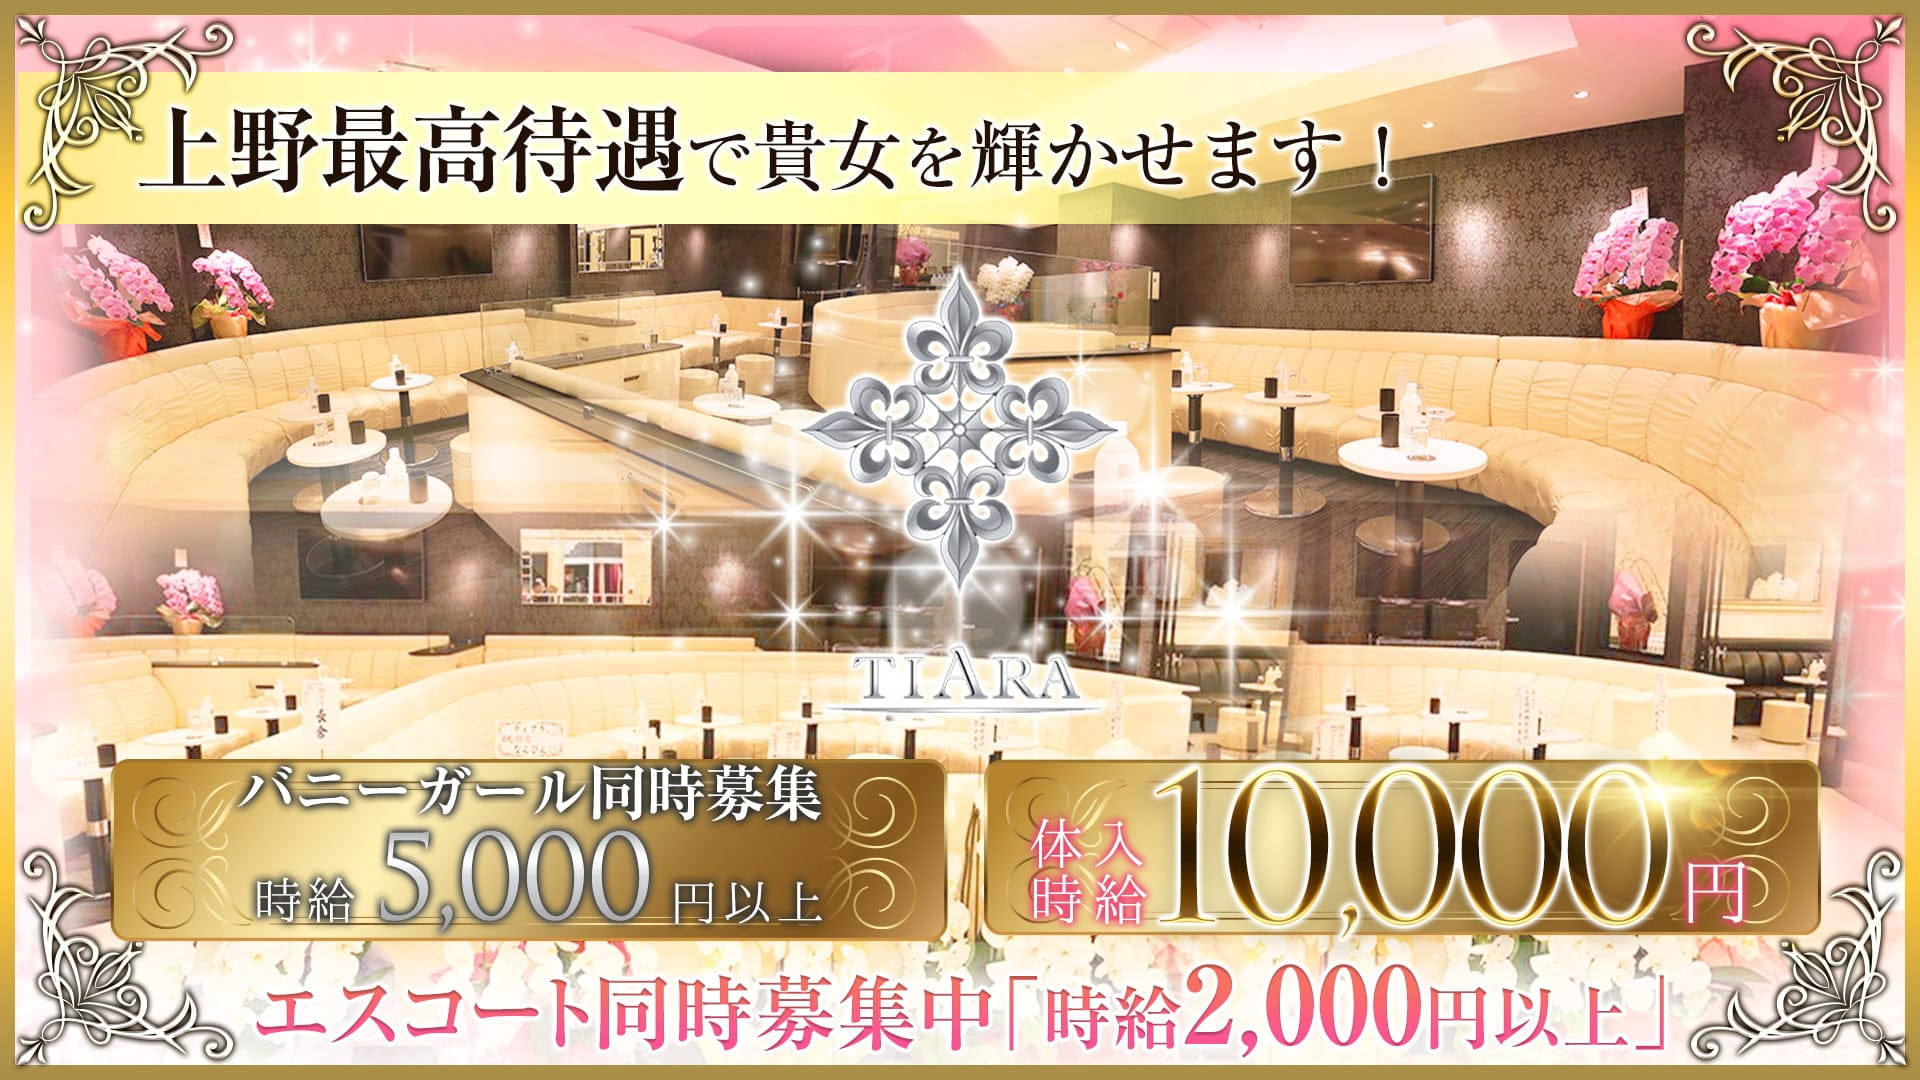 CLUB Tiara(クラブ ティアラ)【公式求人・体入情報】 上野キャバクラ TOP画像